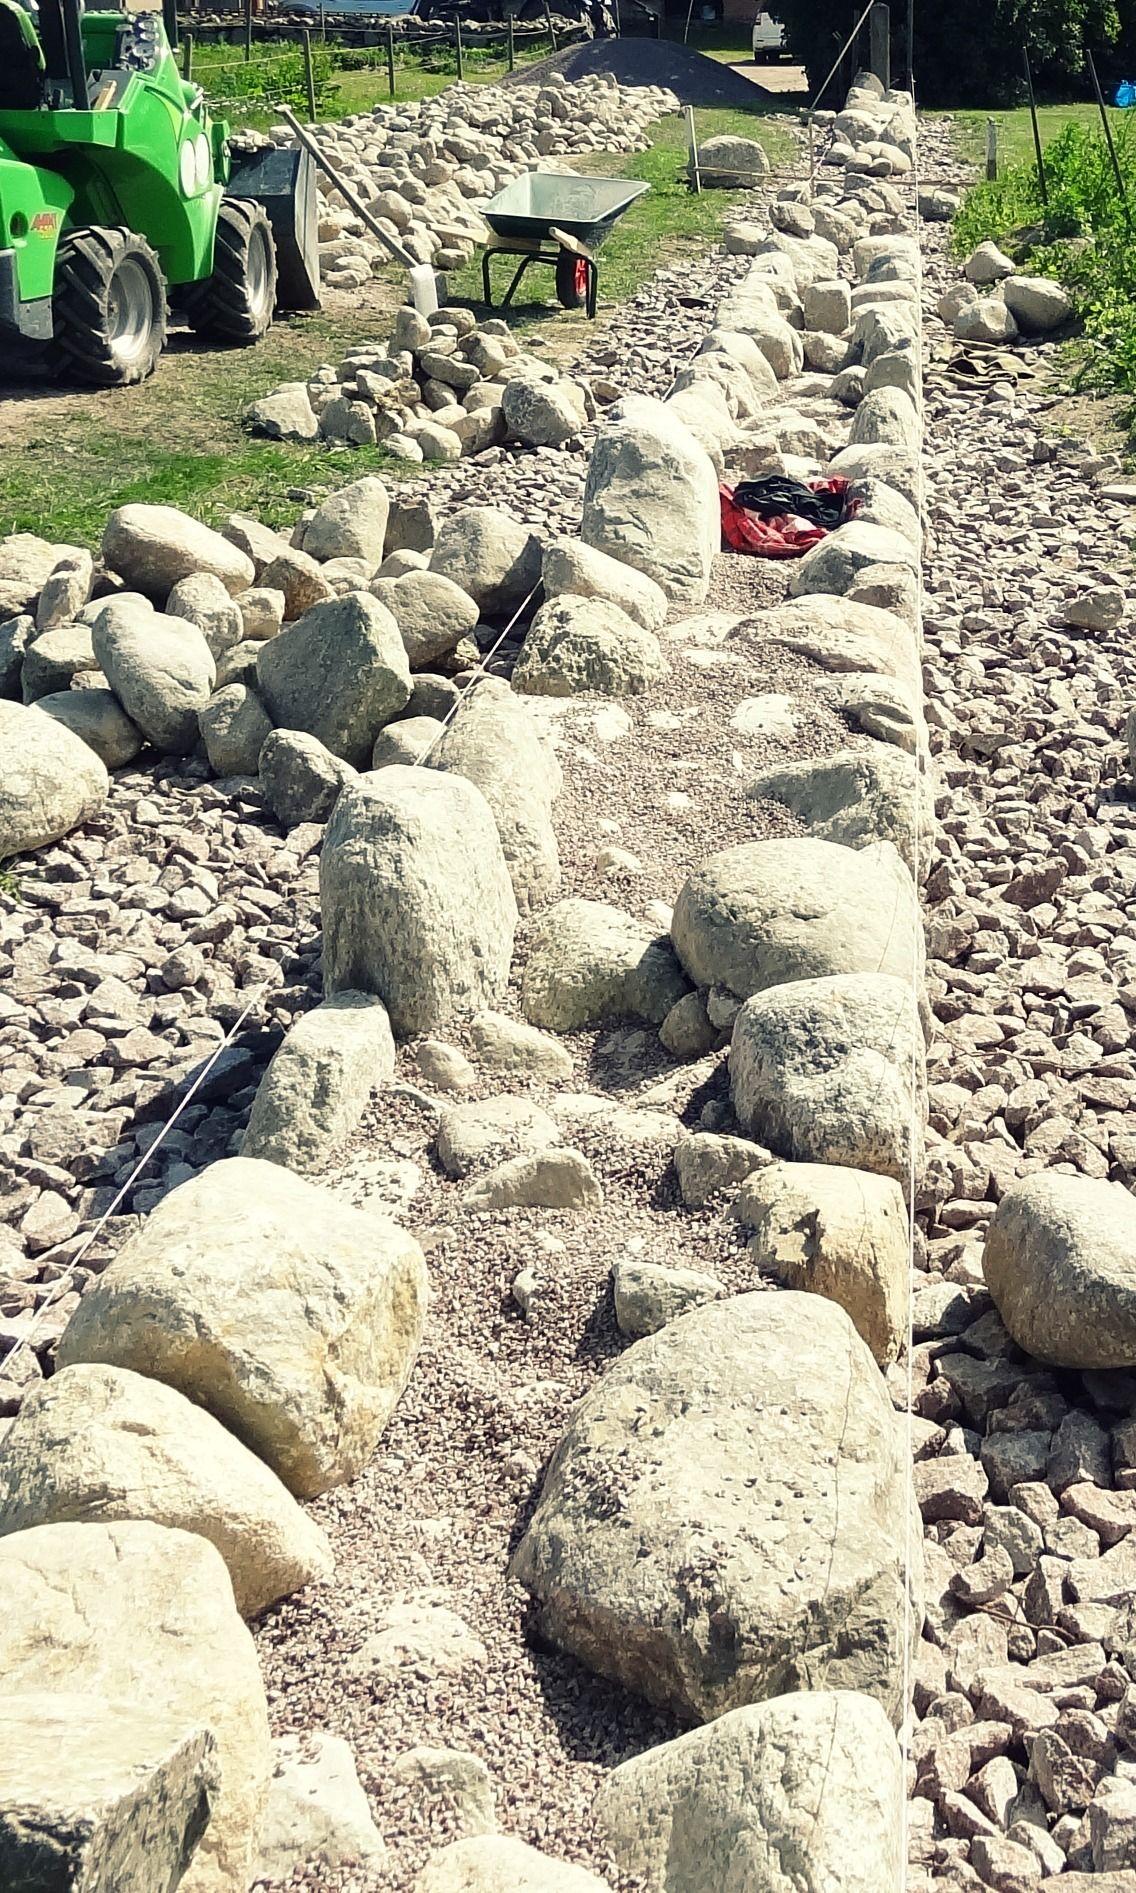 Rock wall drawing rock pillars the wall - 08 13 Stenmur Sten Staket G Rdsg Rdsmur Dry Stone Wall Stone Fence